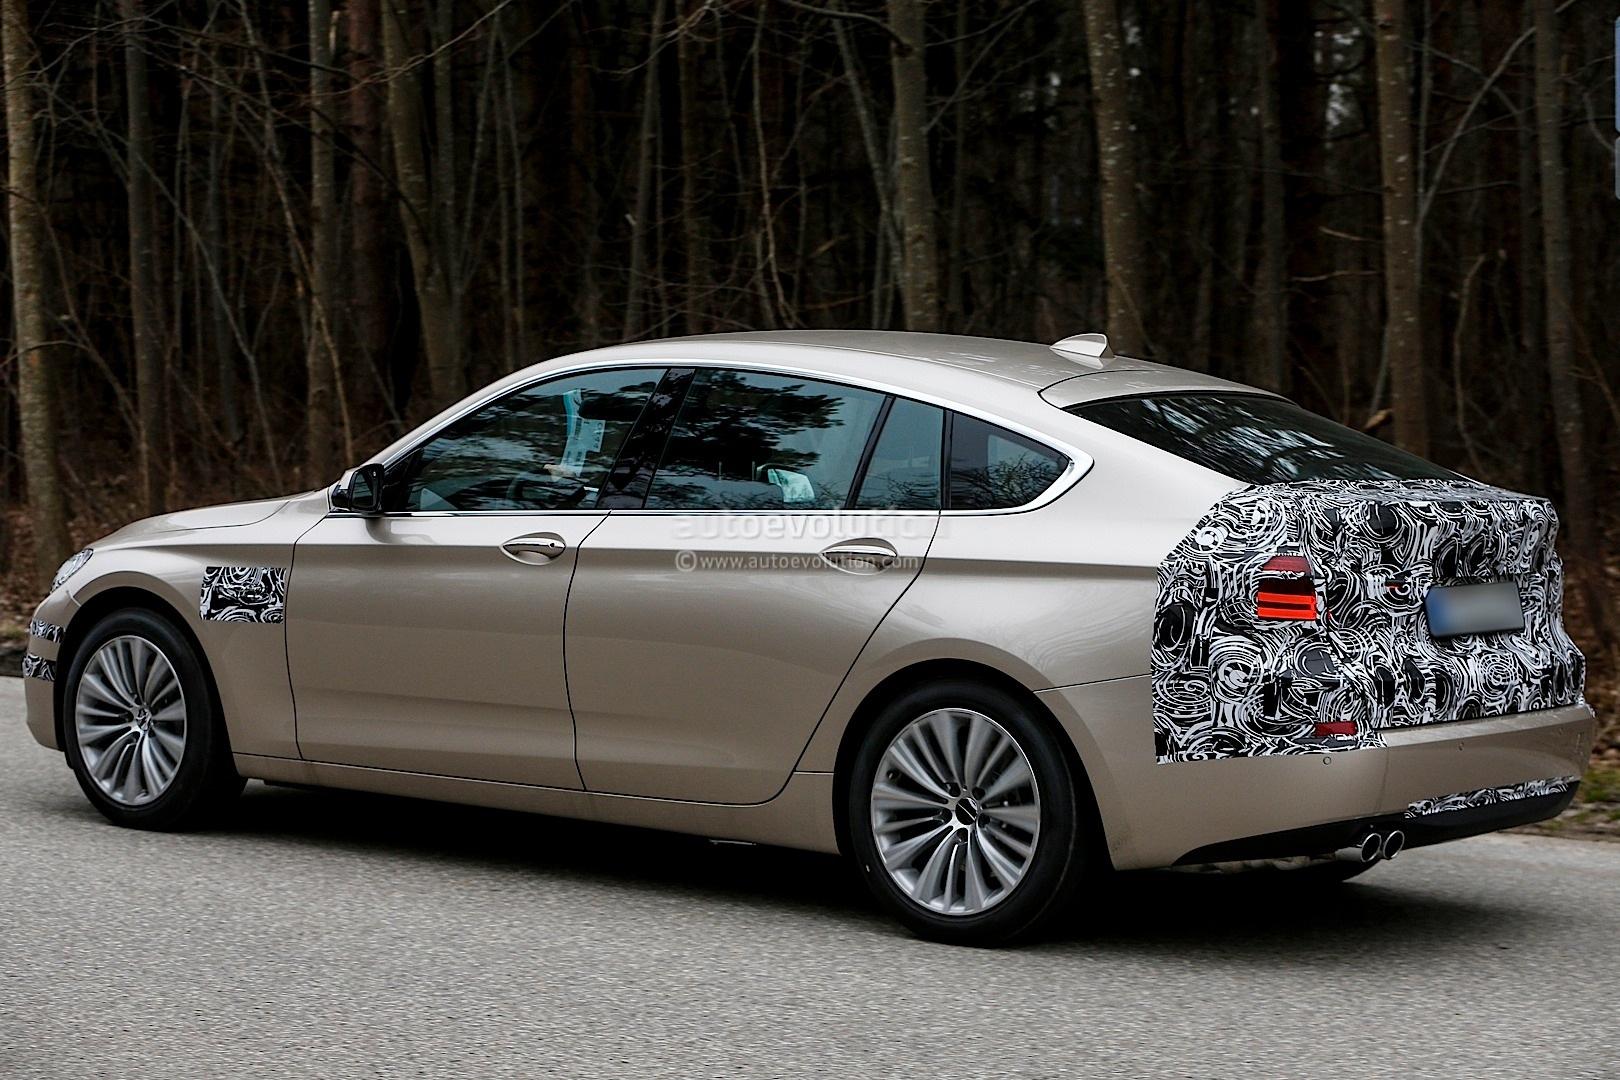 07 Nissan Maxima >> Spyshots: BMW F07 5 Series GT LCI - autoevolution